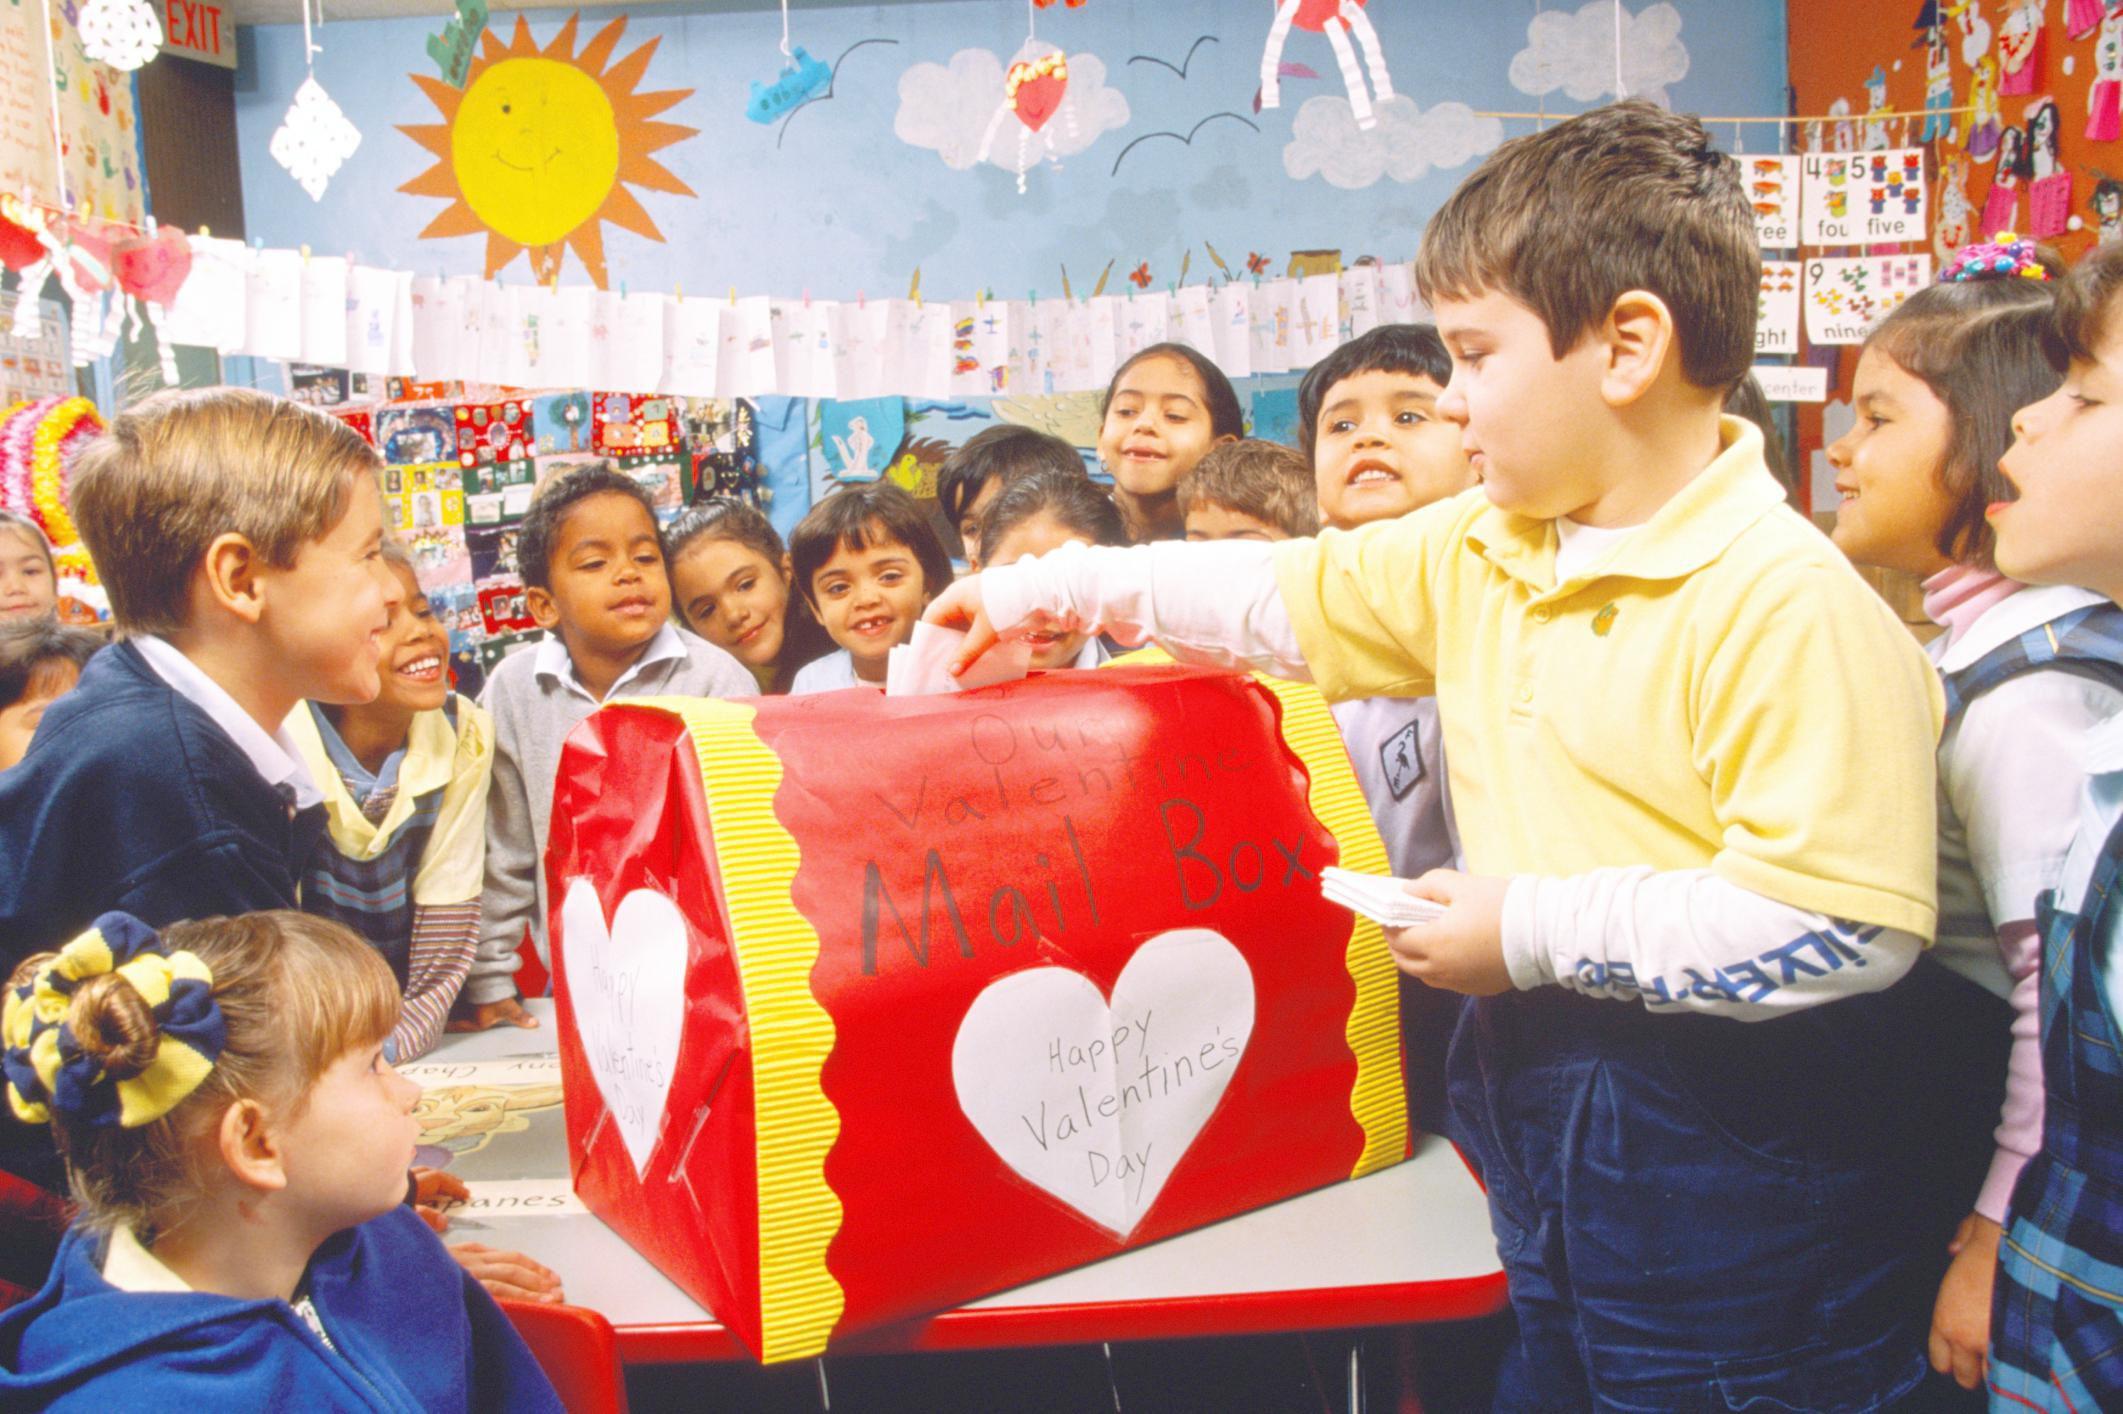 Valentine S Day Celebrations At School